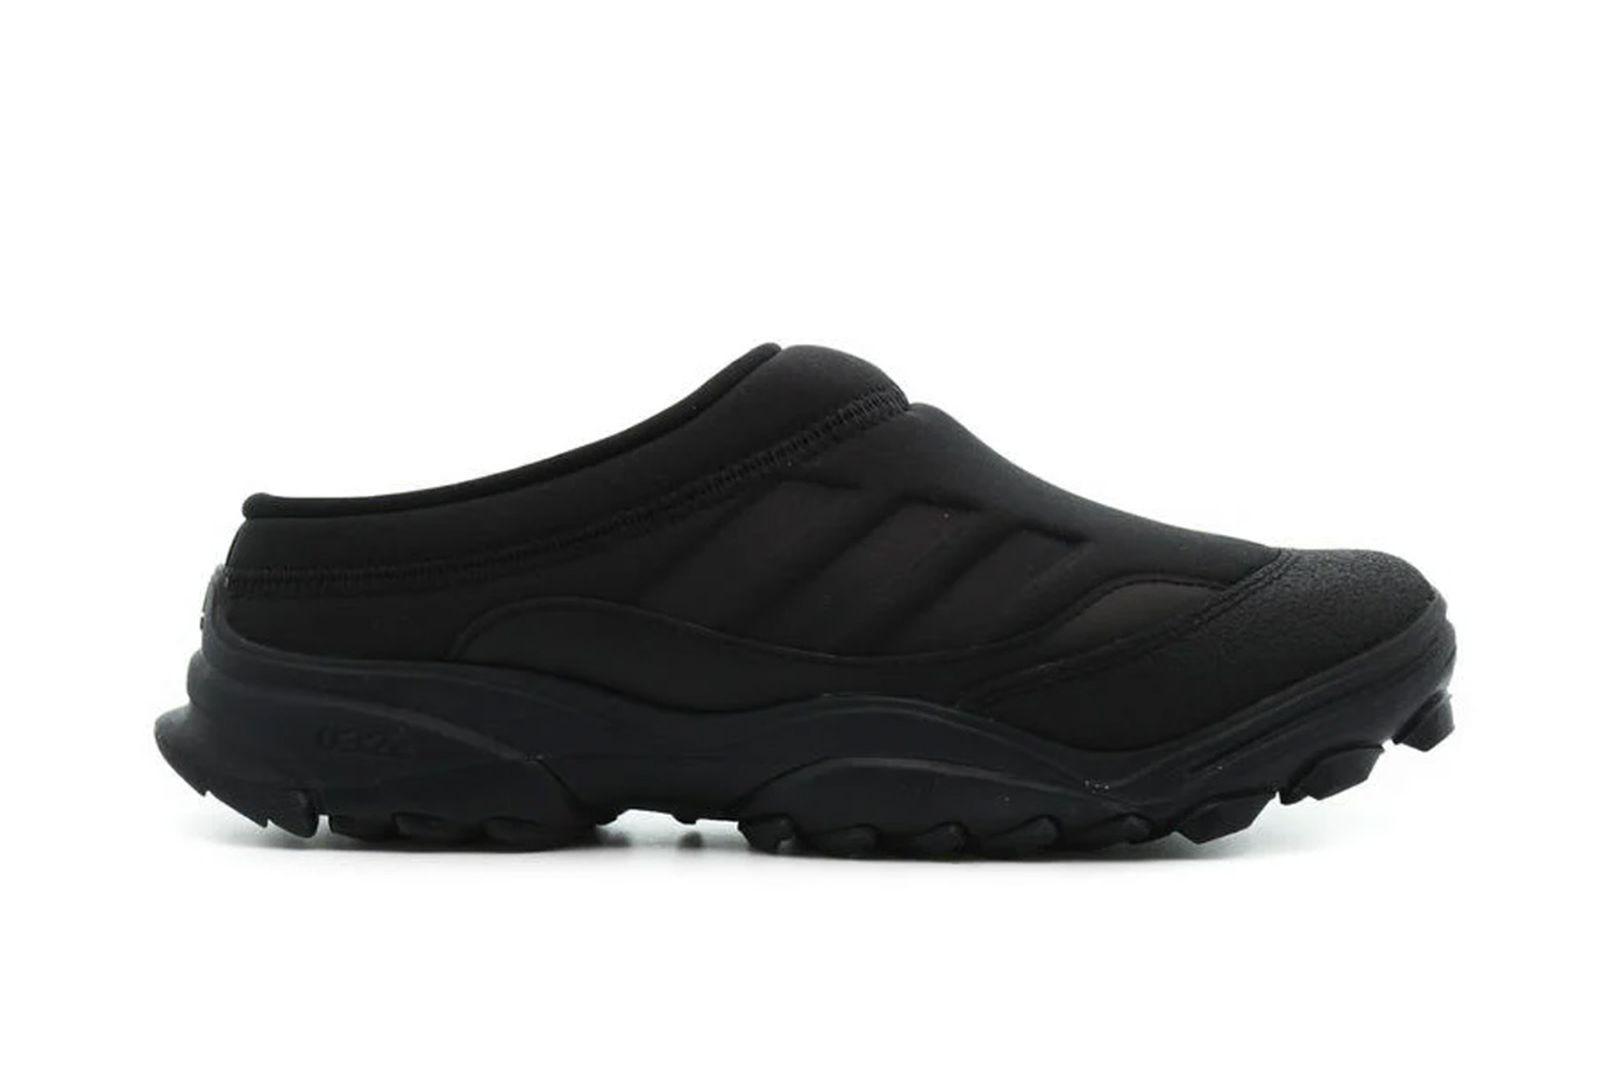 032c-adidas-gsg-running-tr-gsg-mule-release-date-price-04